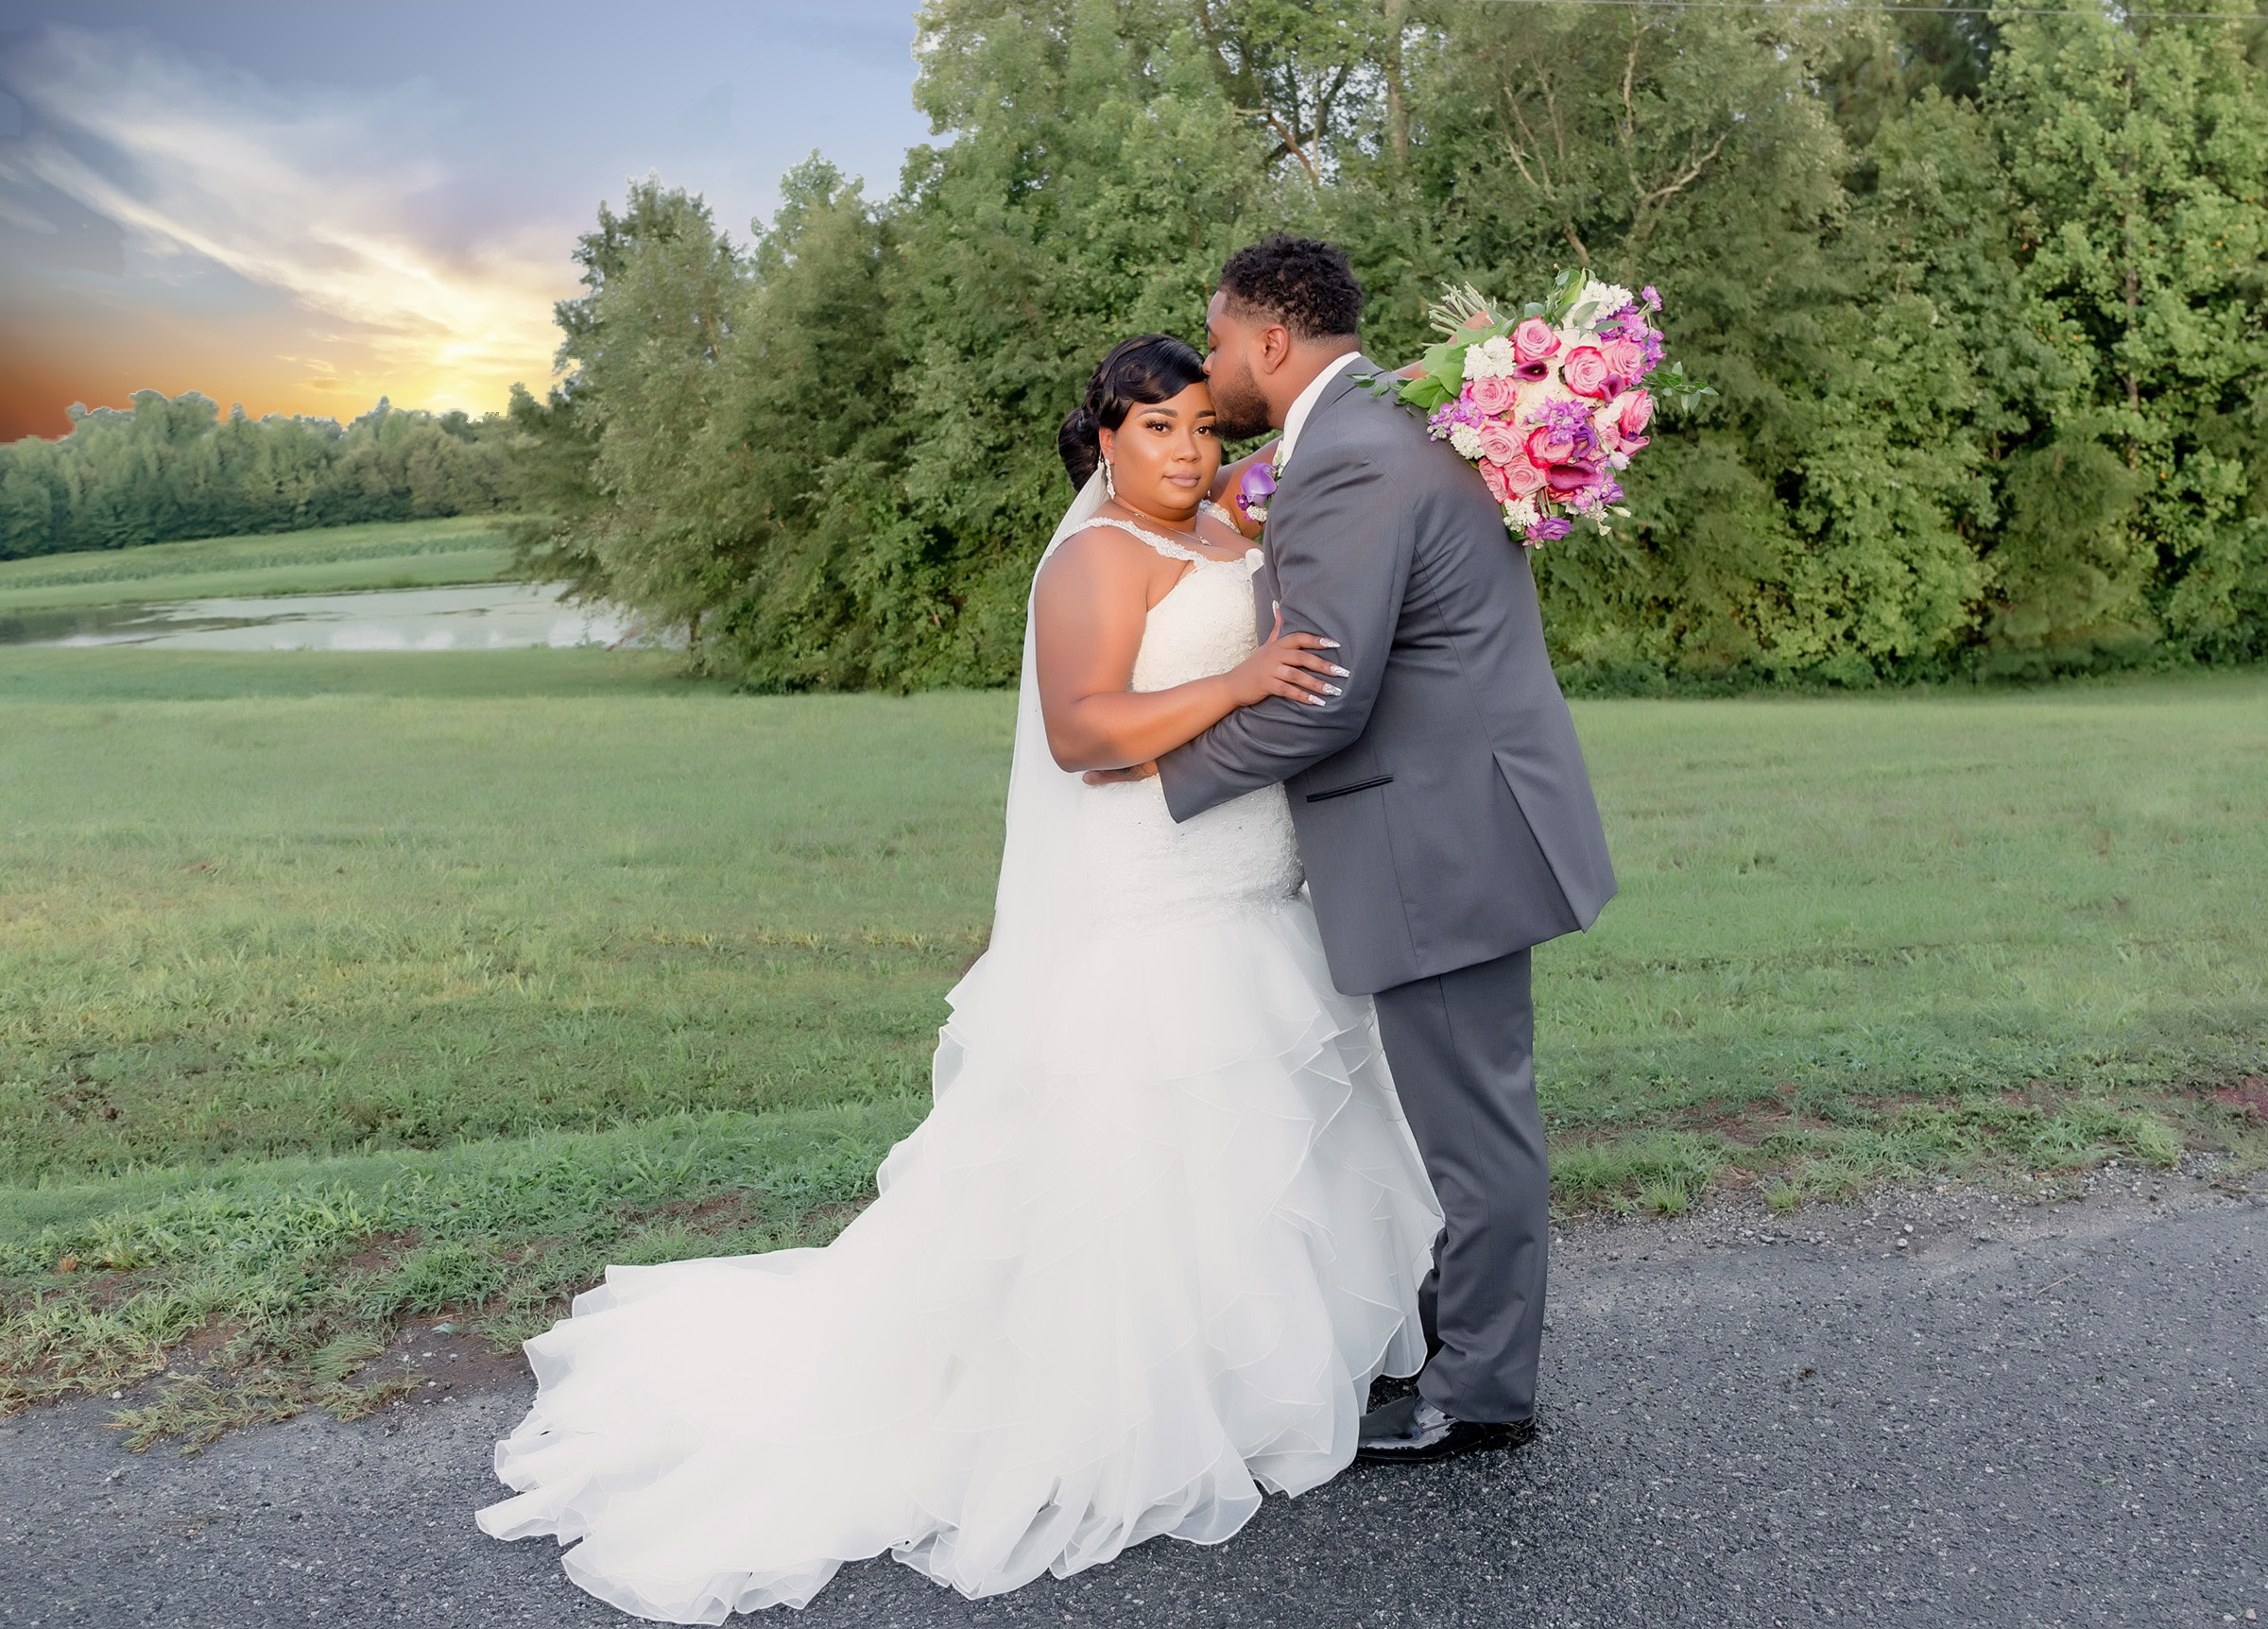 2020_Ashley_wedding_protraits_4_1